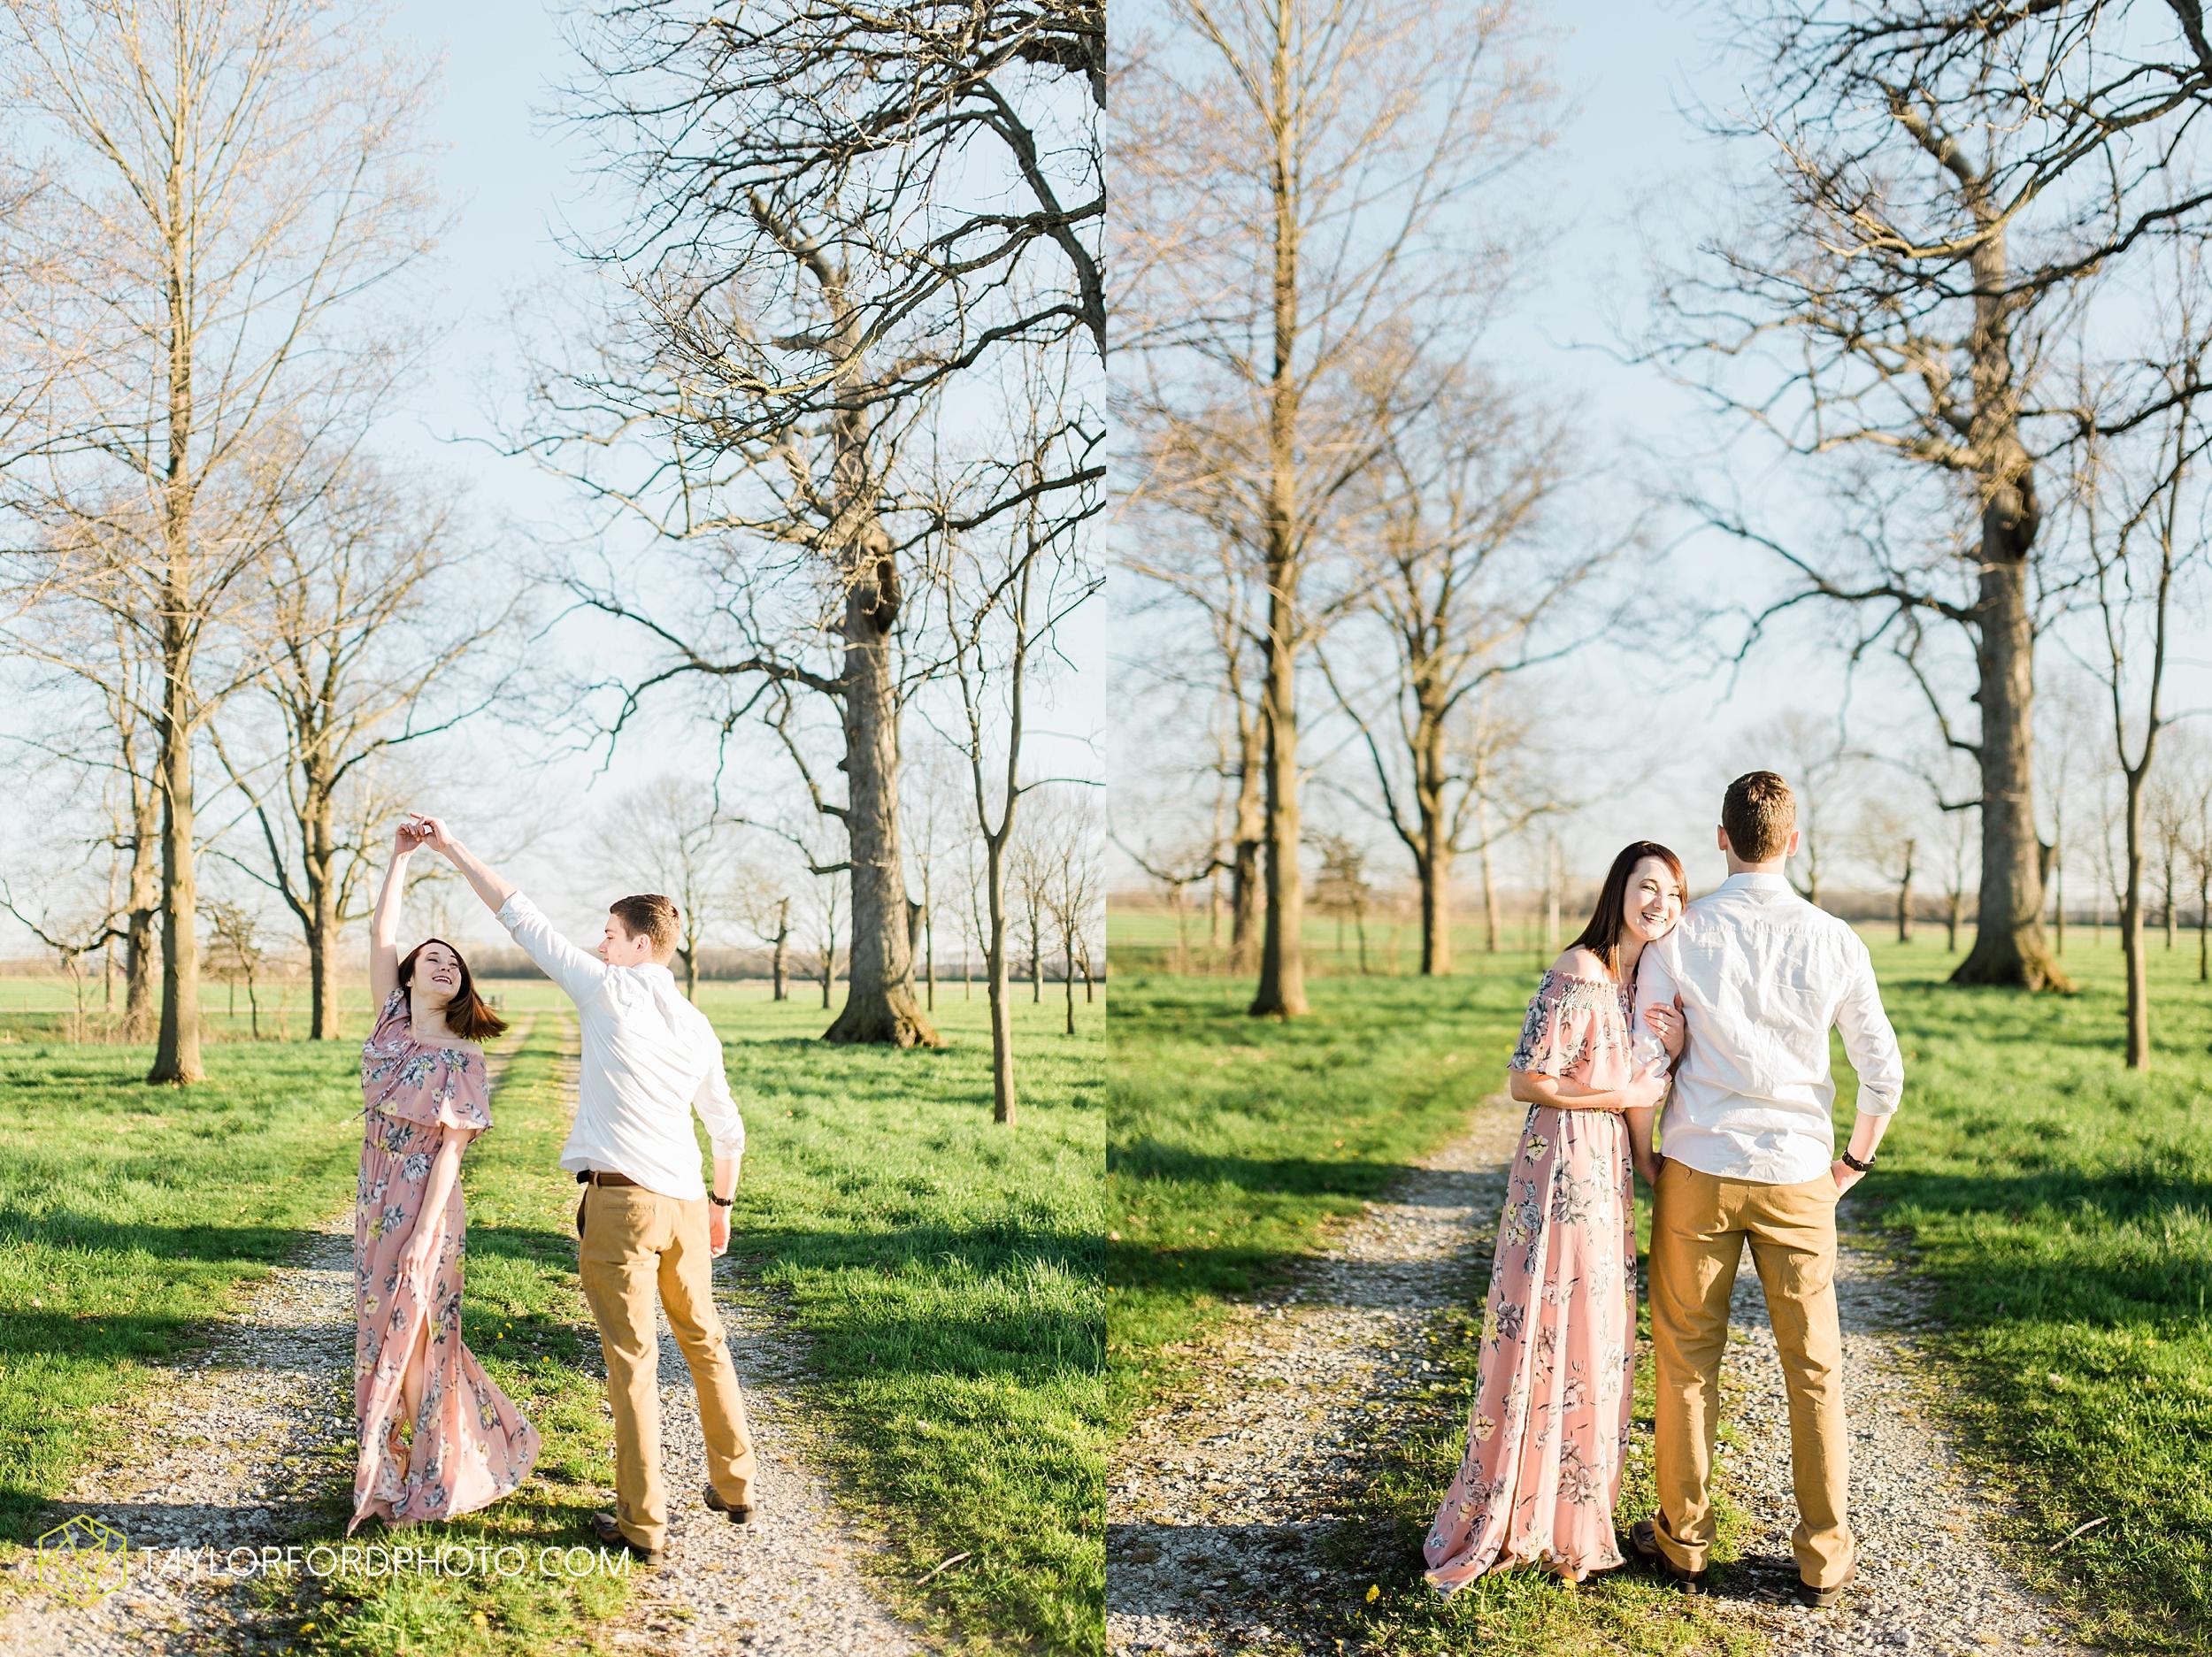 troy-ohio-engagement-wedding-photographer-Taylor-Ford-Photography_7026.jpg